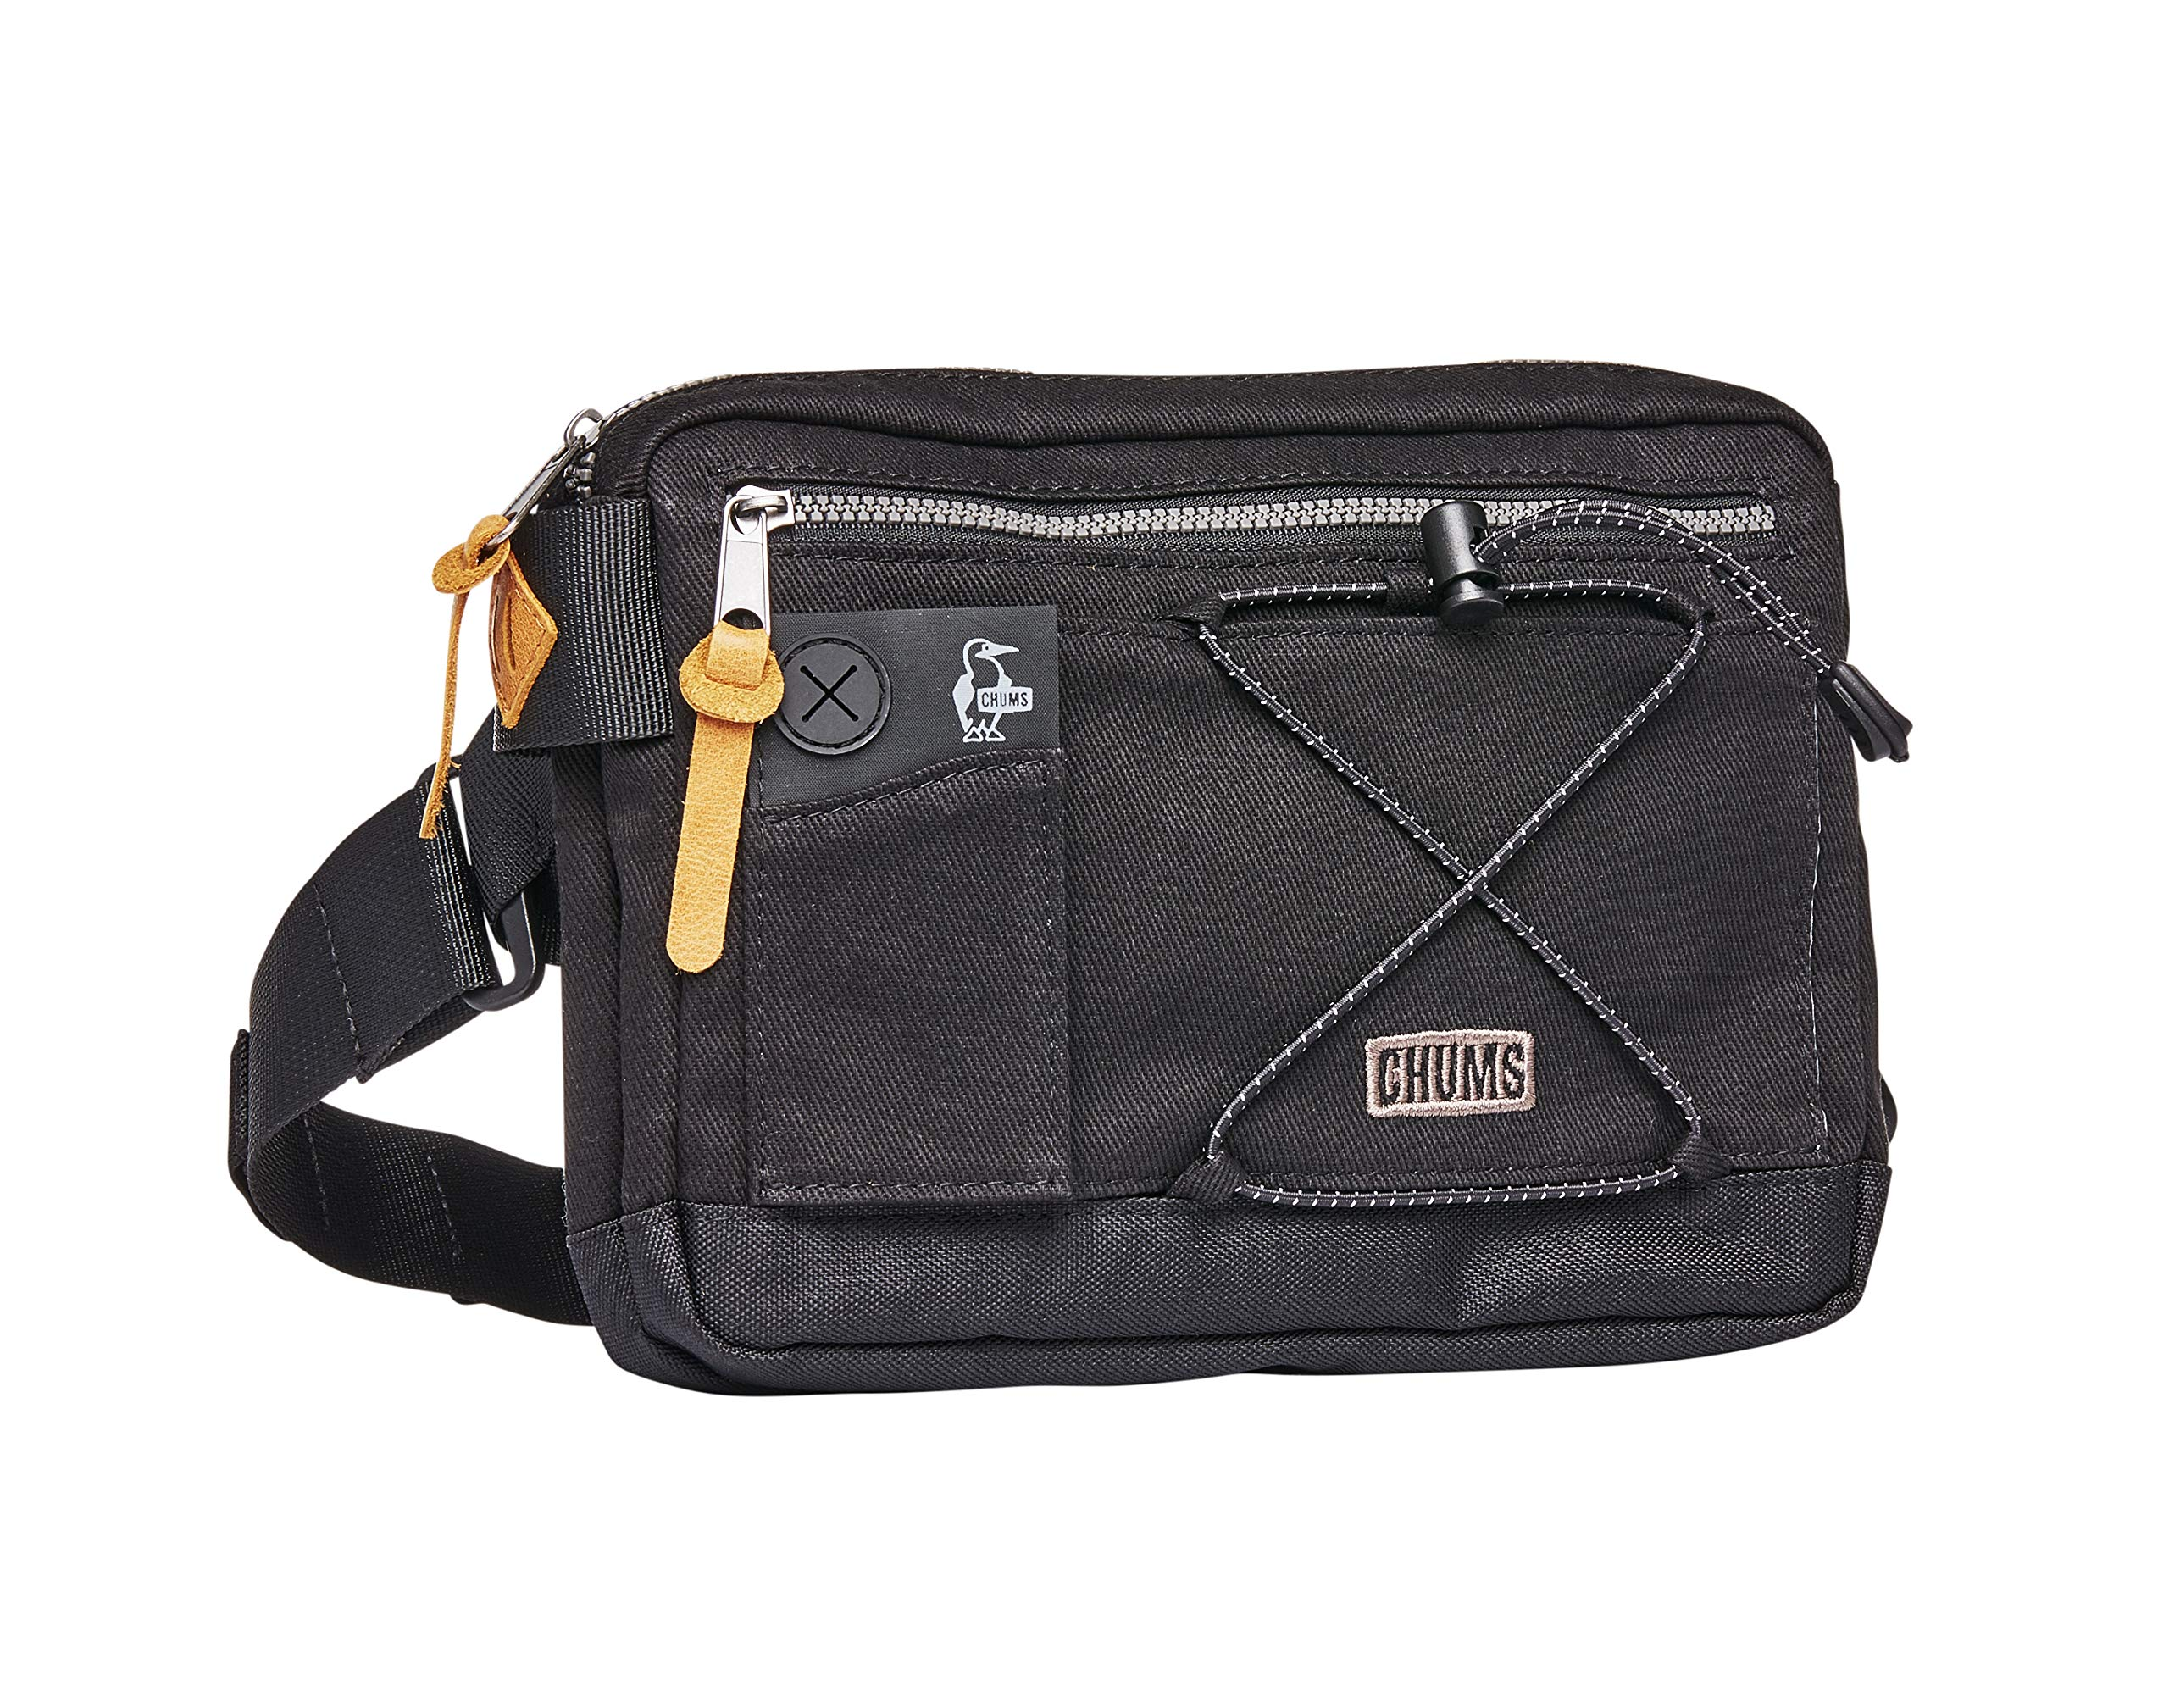 Chums Scrambler Reflective Waist Pack Shoulder Bag, Black, One Size by Chums